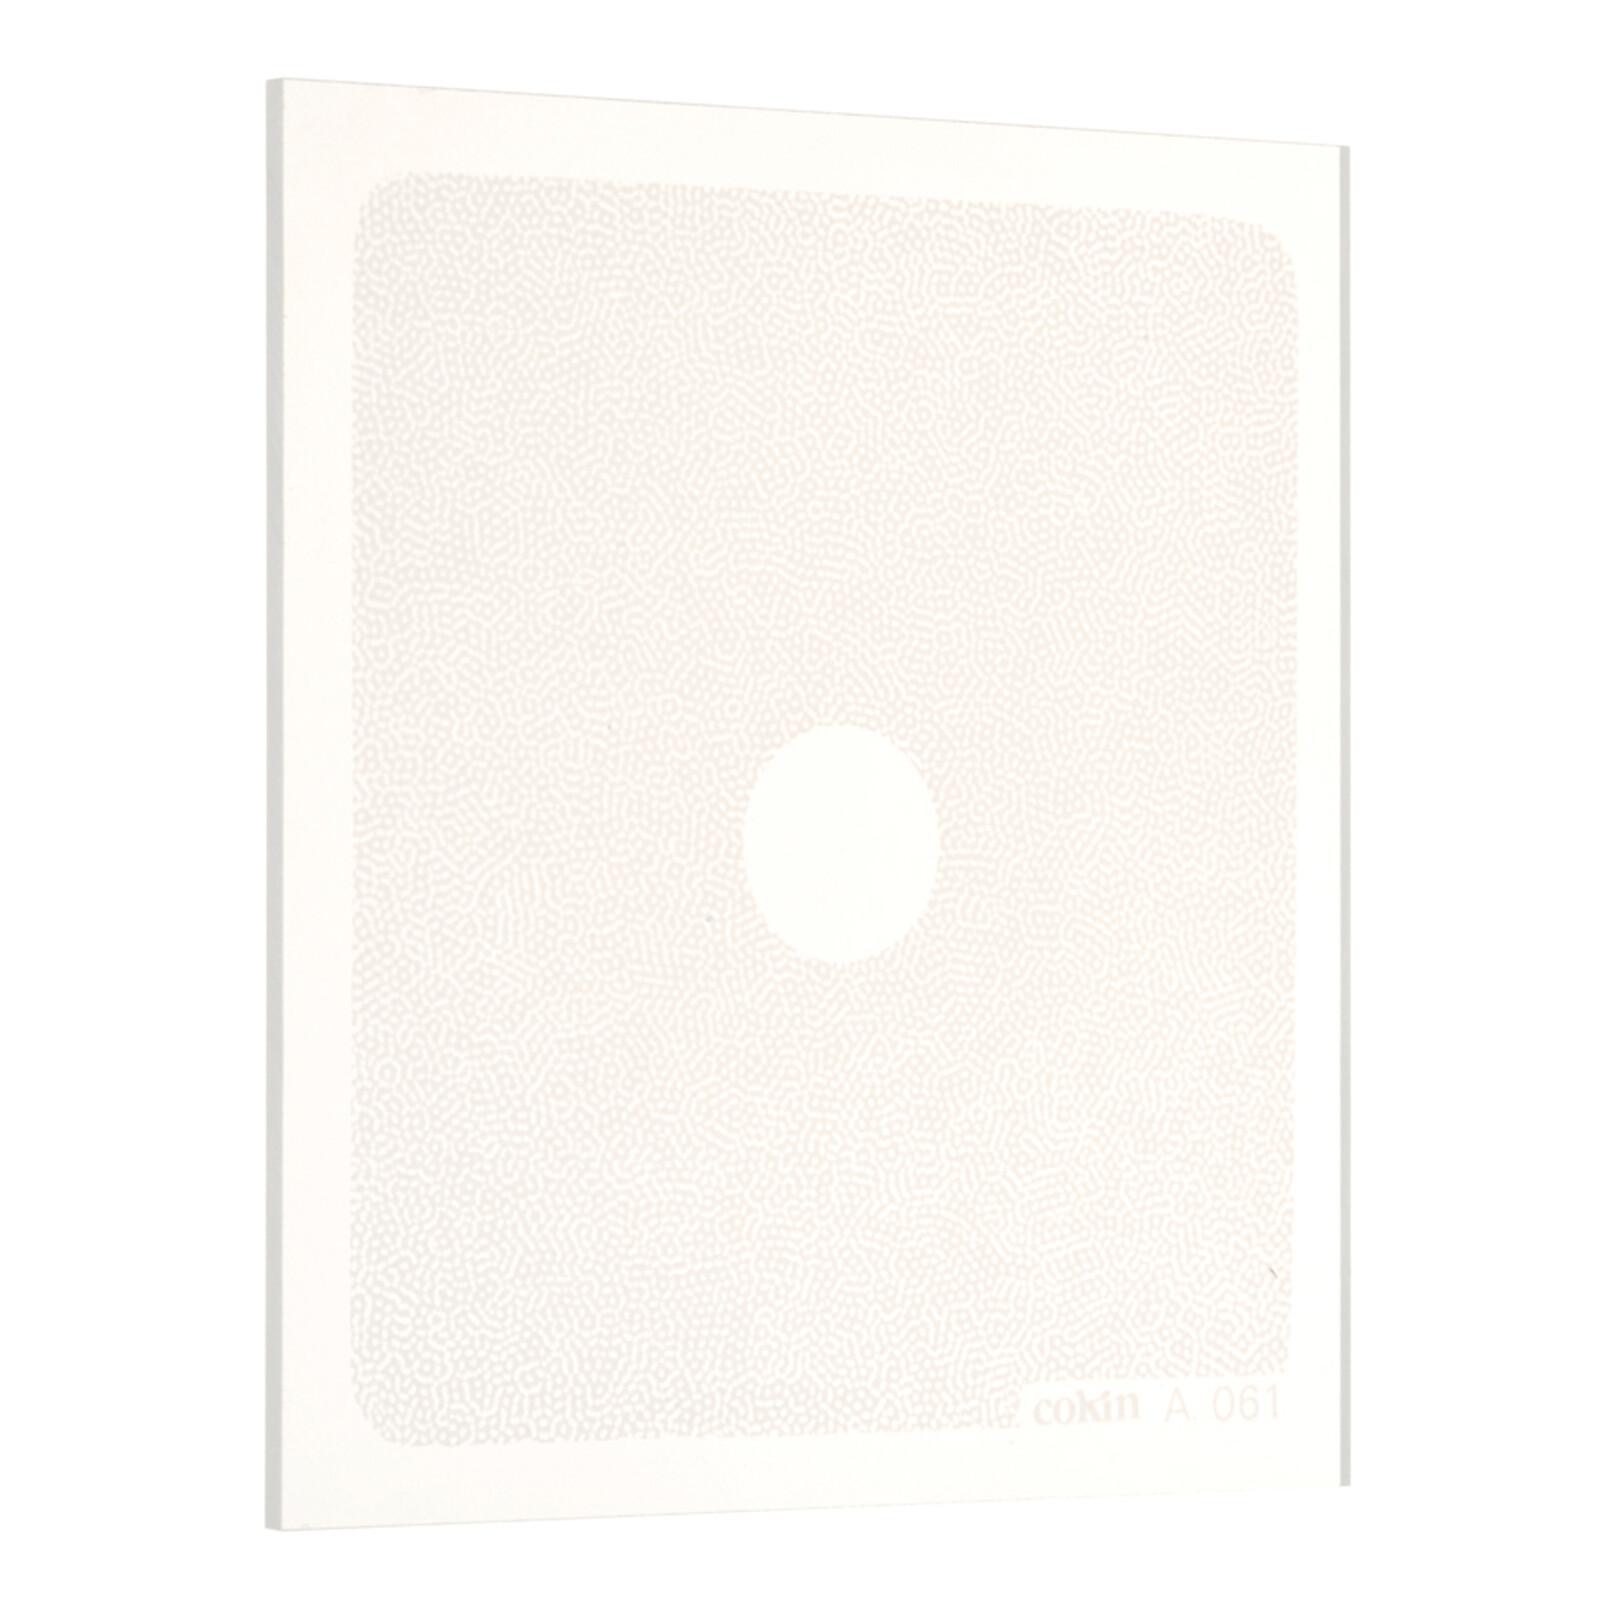 Cokin P061 Center Spot Incolor 2